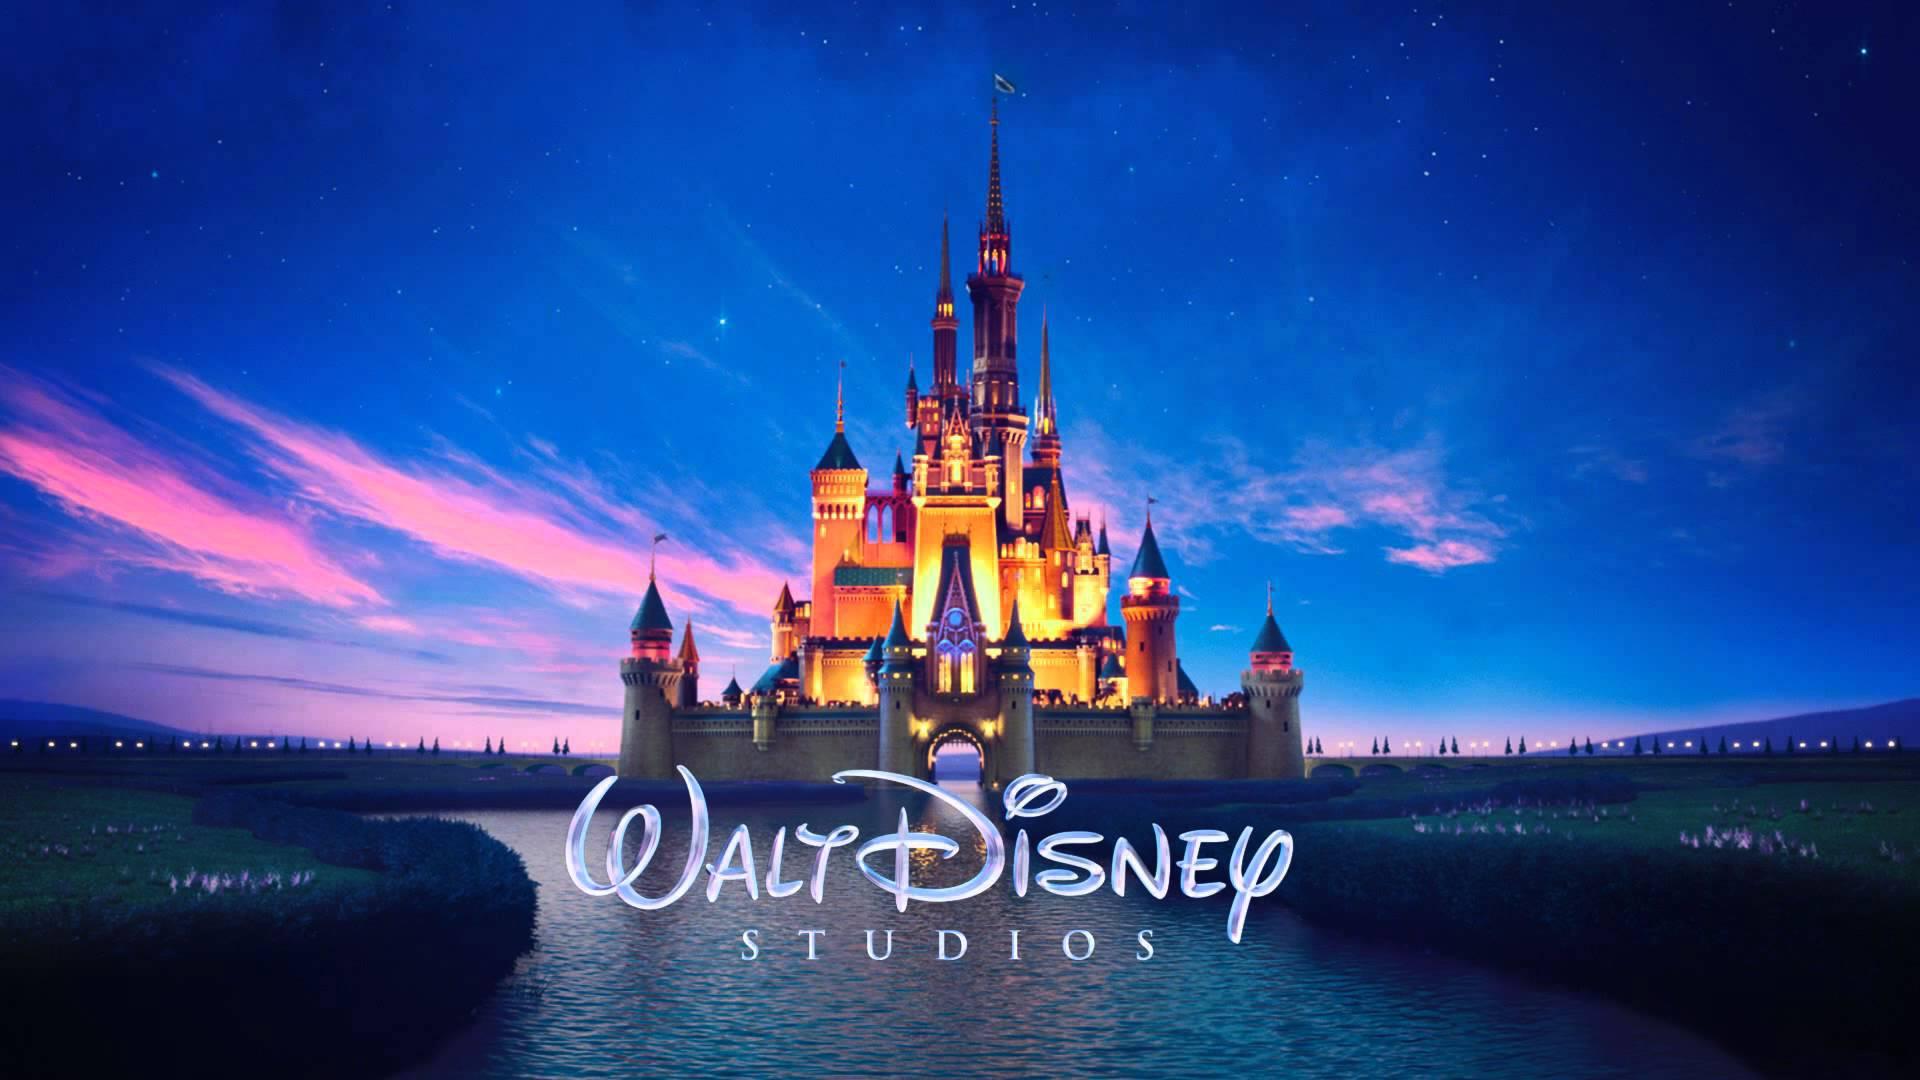 Walt Disney снимет фильм помотивам романа Сервантеса «Дон Кихот»